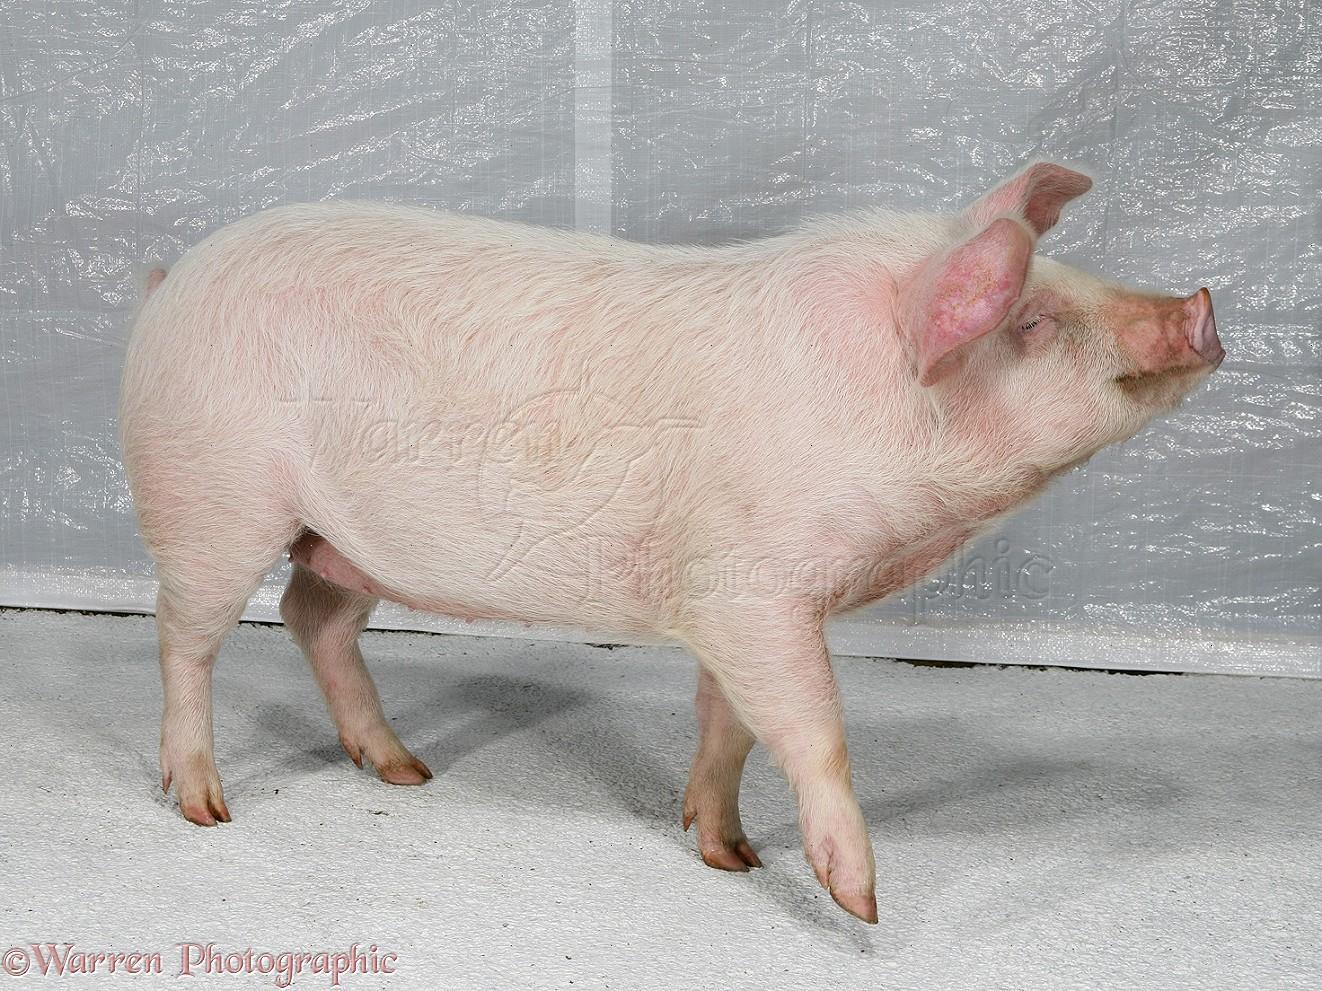 Pink piglets - photo#19